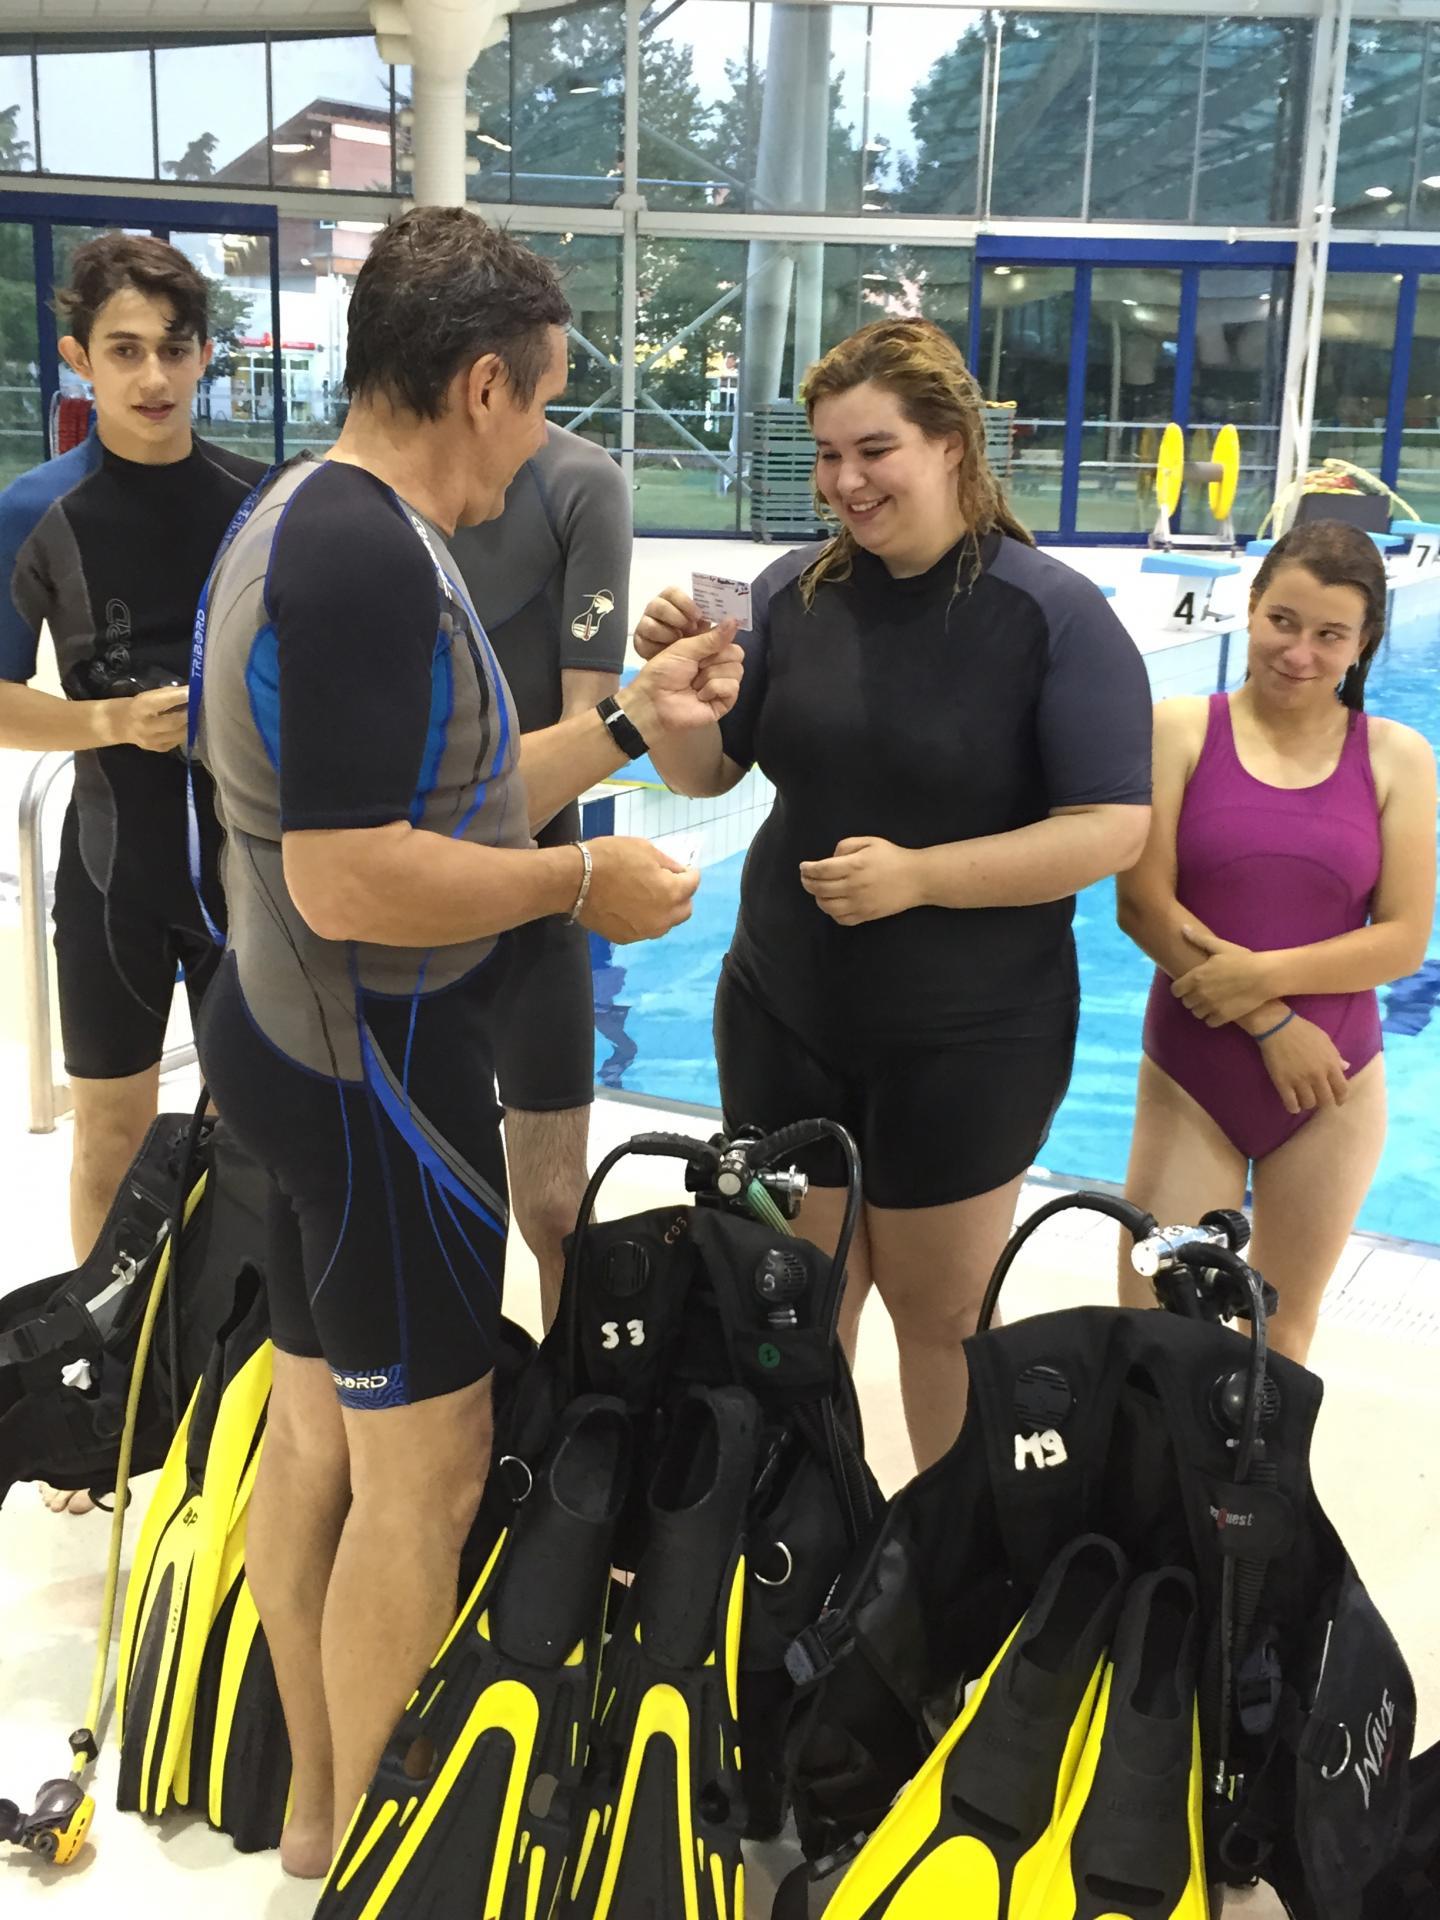 SABBE plongée 2015 - Formation PESH 6m